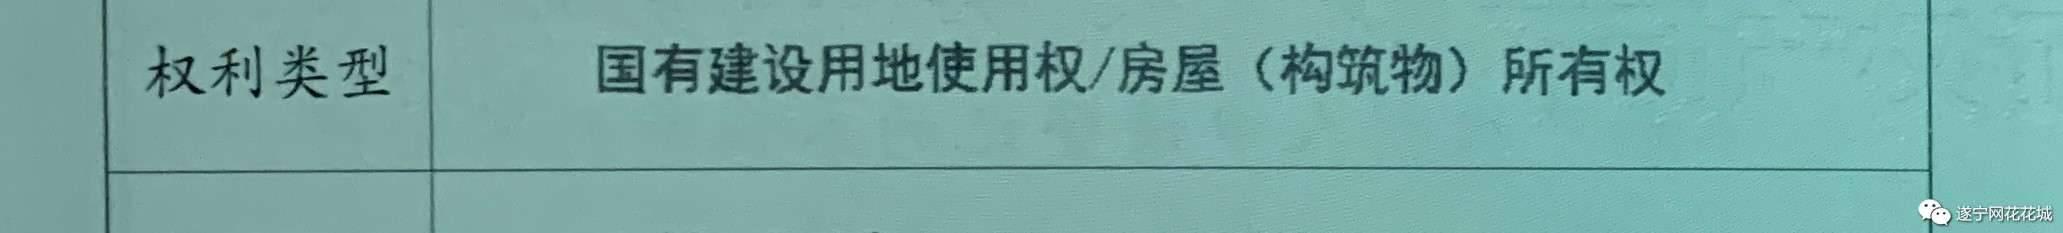 IMG_4389 - 副本.JPG